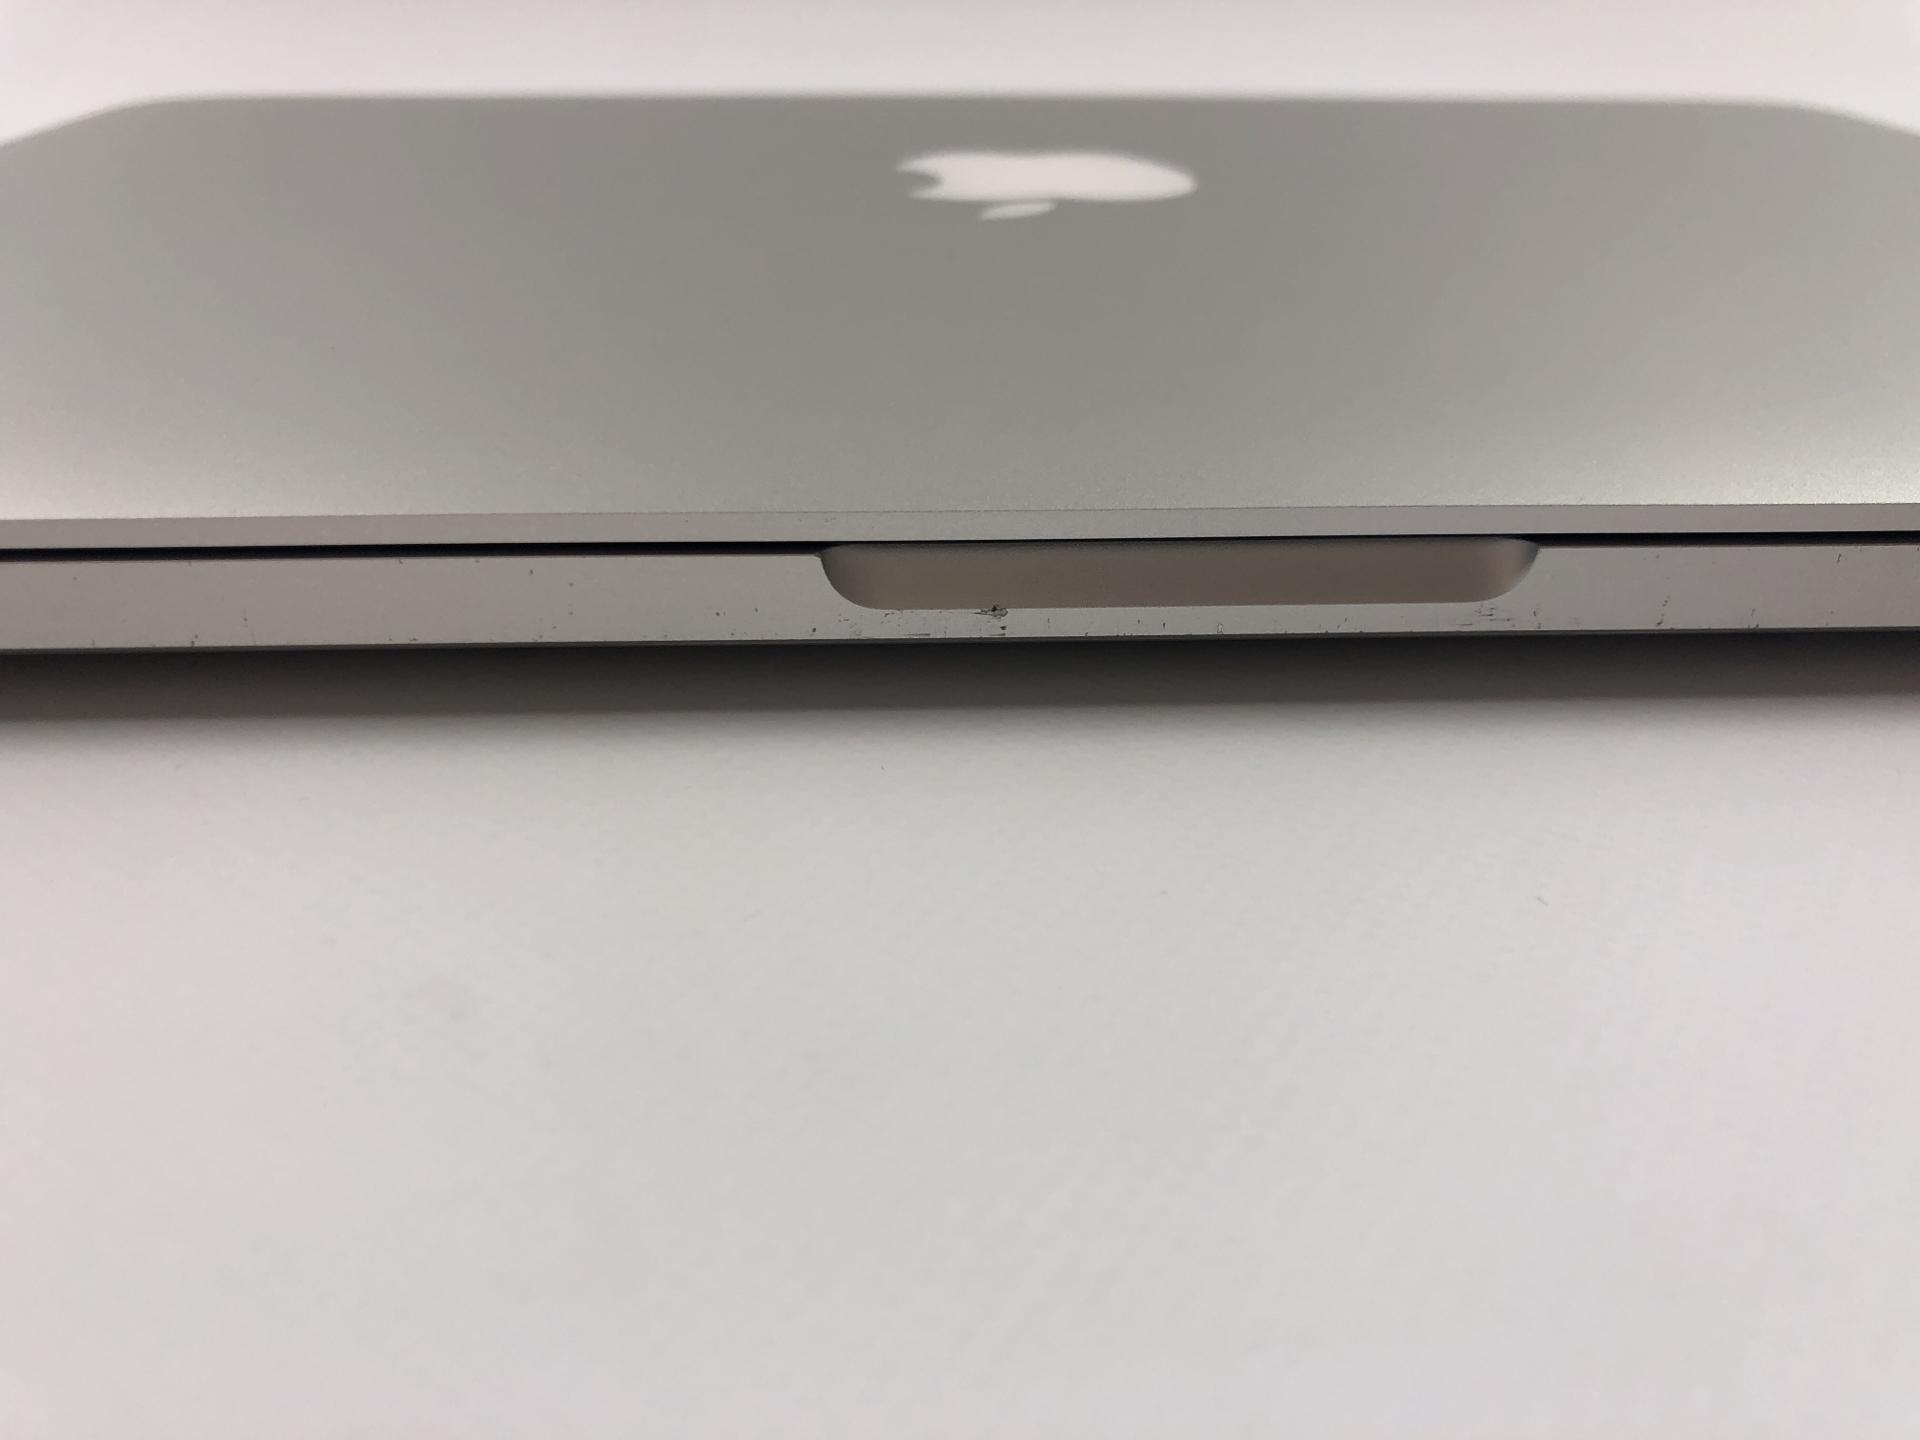 "MacBook Pro Retina 13"" Mid 2014 (Intel Core i5 2.6 GHz 8 GB RAM 256 GB SSD), Intel Core i5 2.6 GHz, 8 GB RAM, 256 GB SSD, obraz 4"